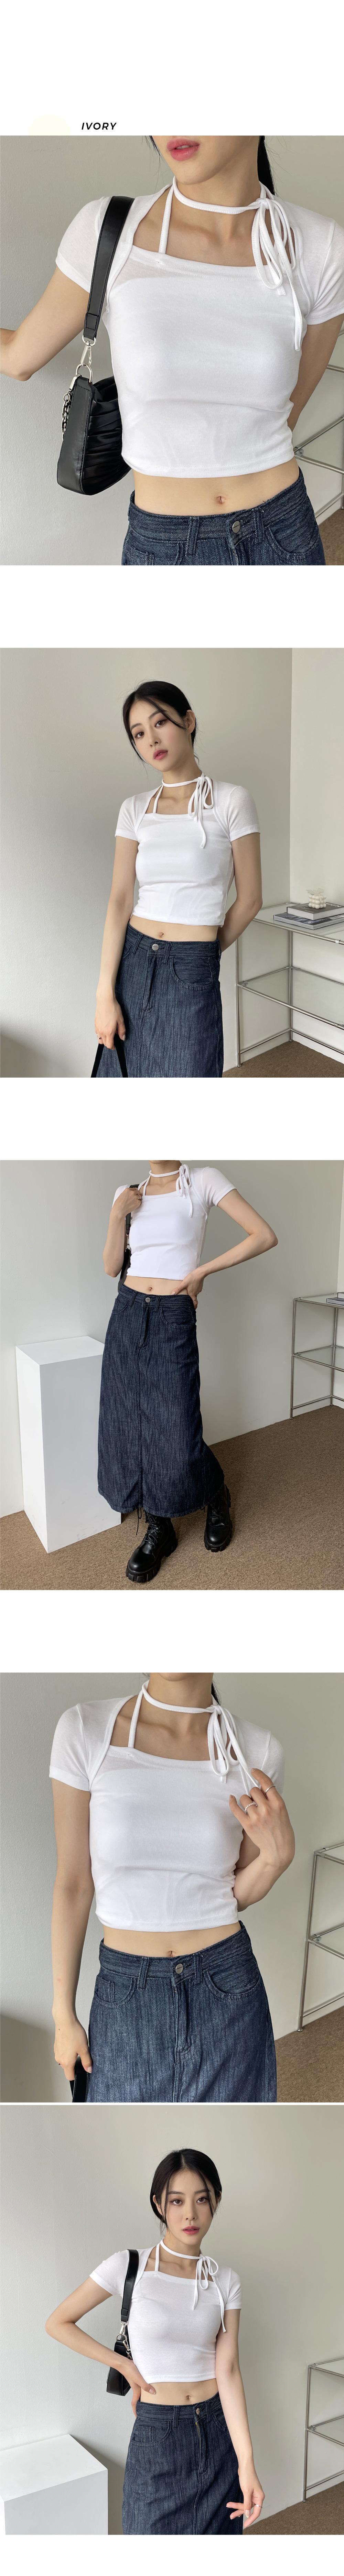 Irene Choker Halter Bolero Crop Short Sleeve T-shirt